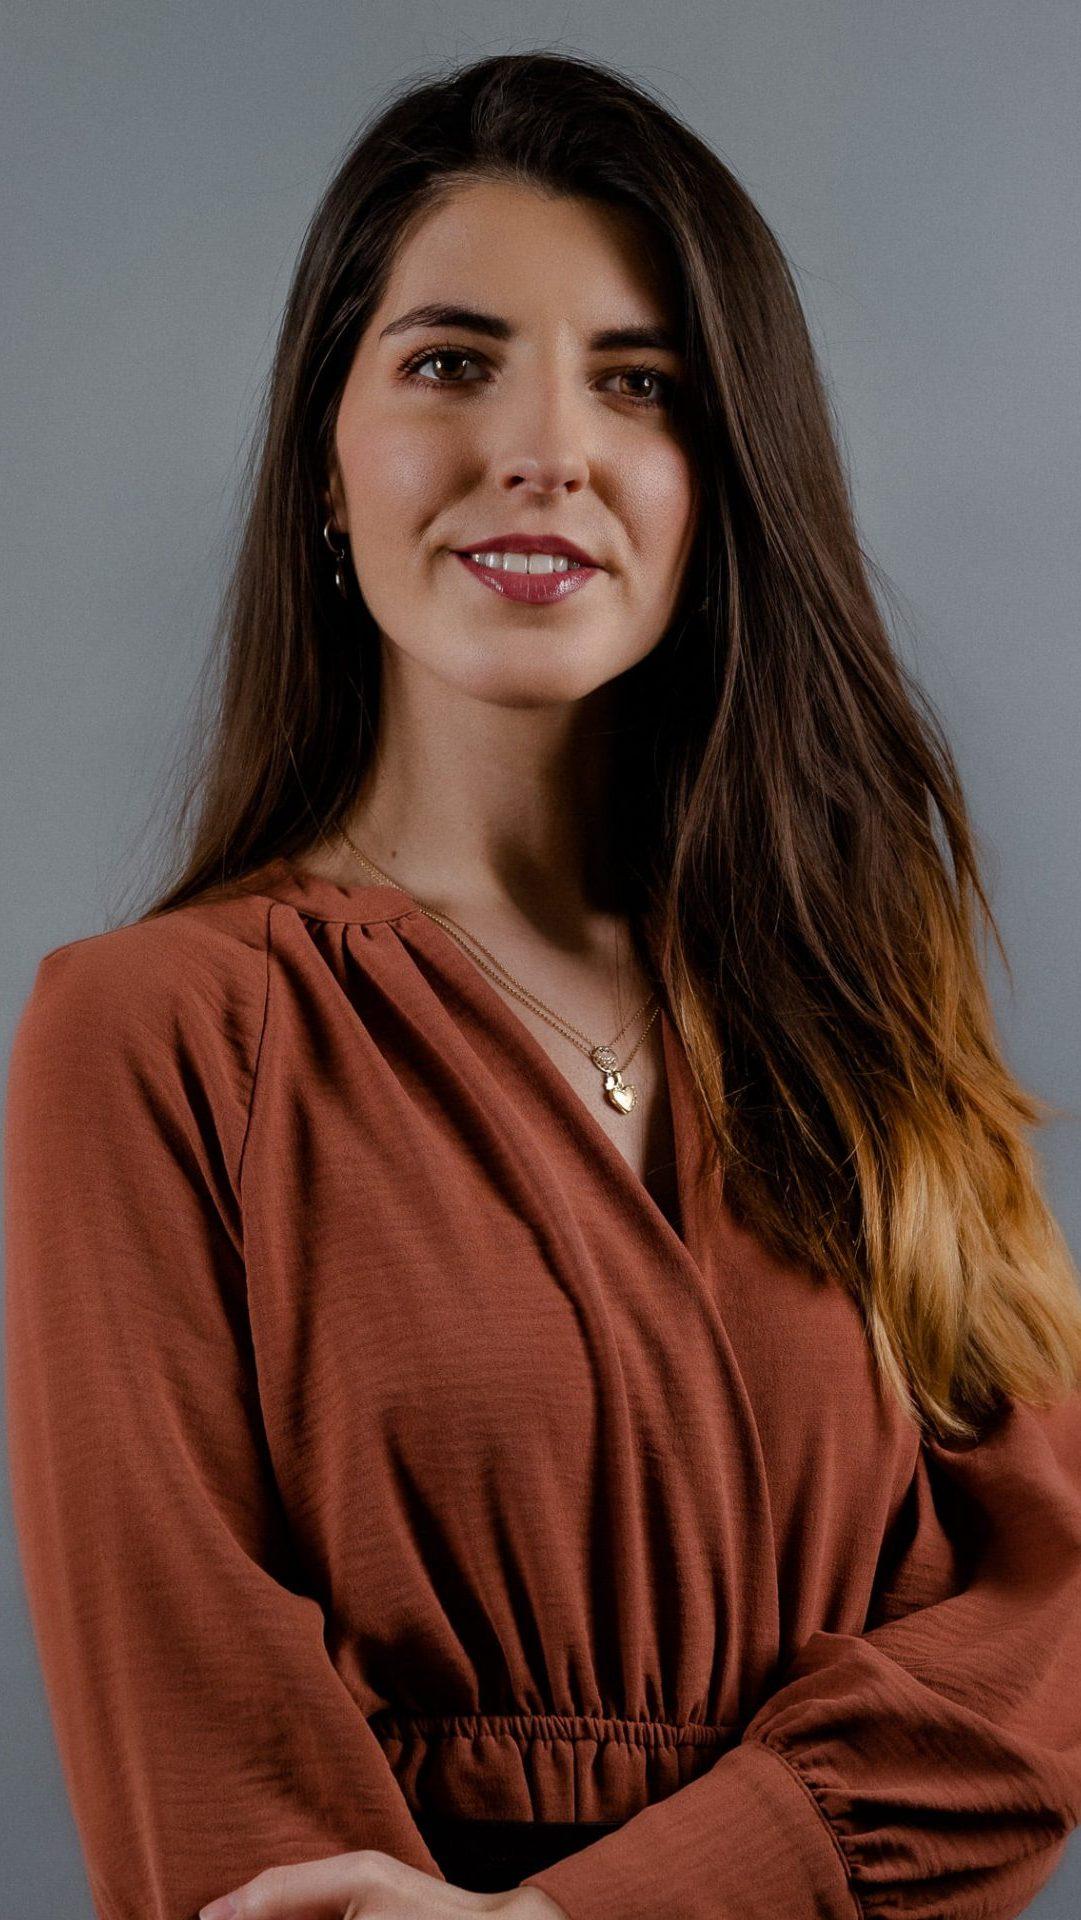 Cristina Torz